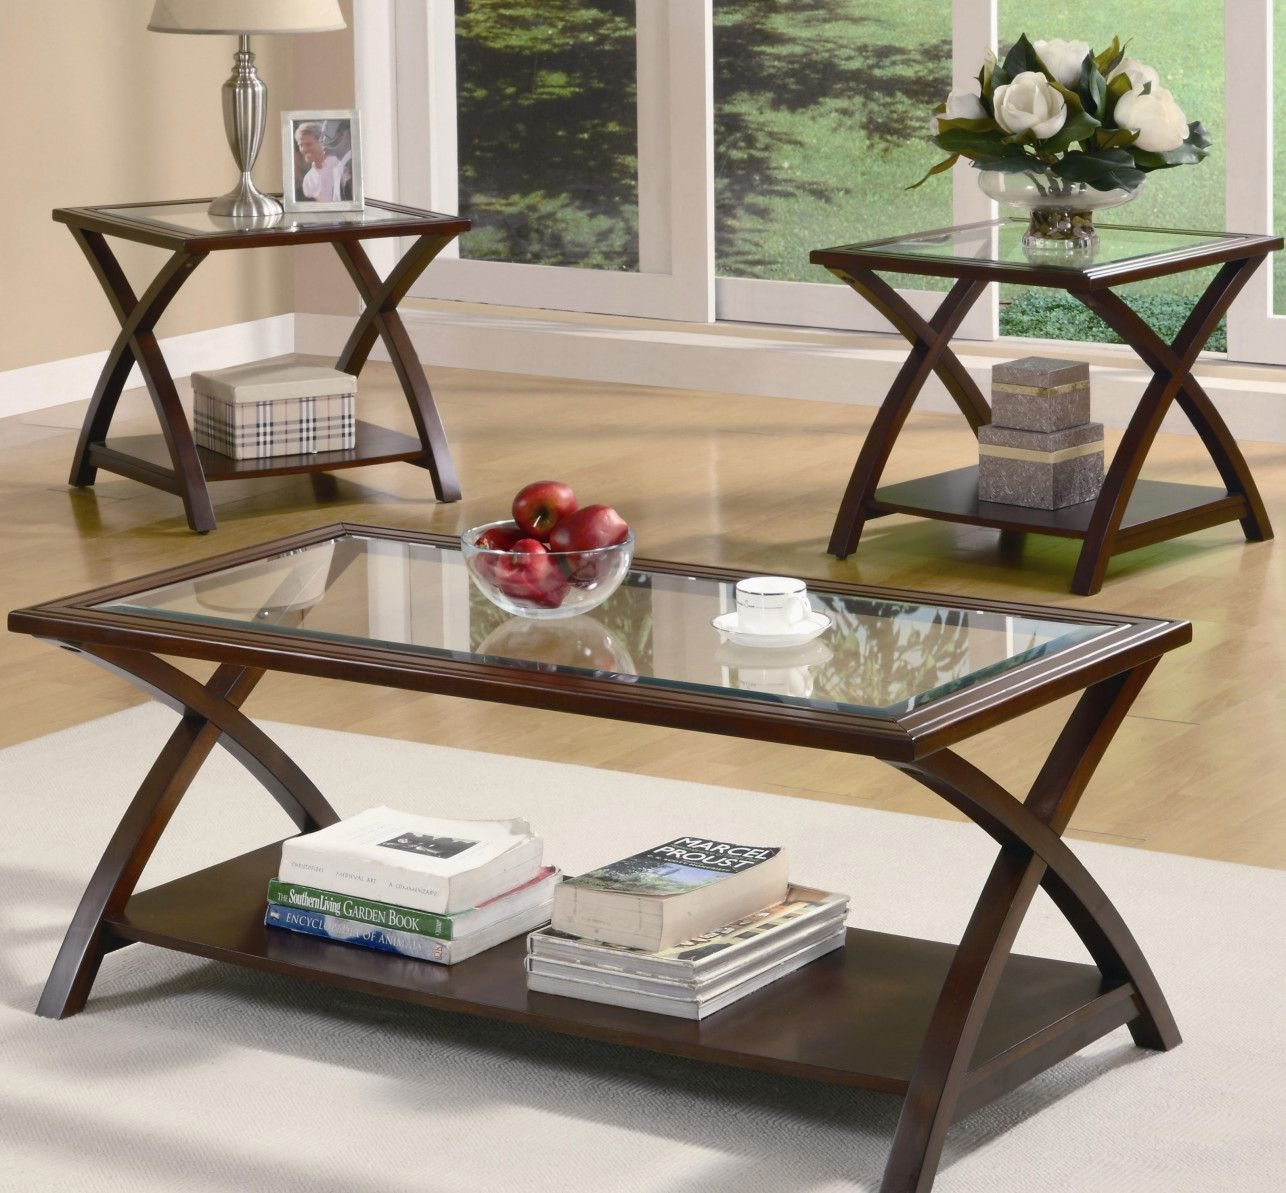 20 Elegant Ashley Furniture Glass Top Coffee Table 2018 Coffee Table End Table Set Living Room Table Sets Coffee Table